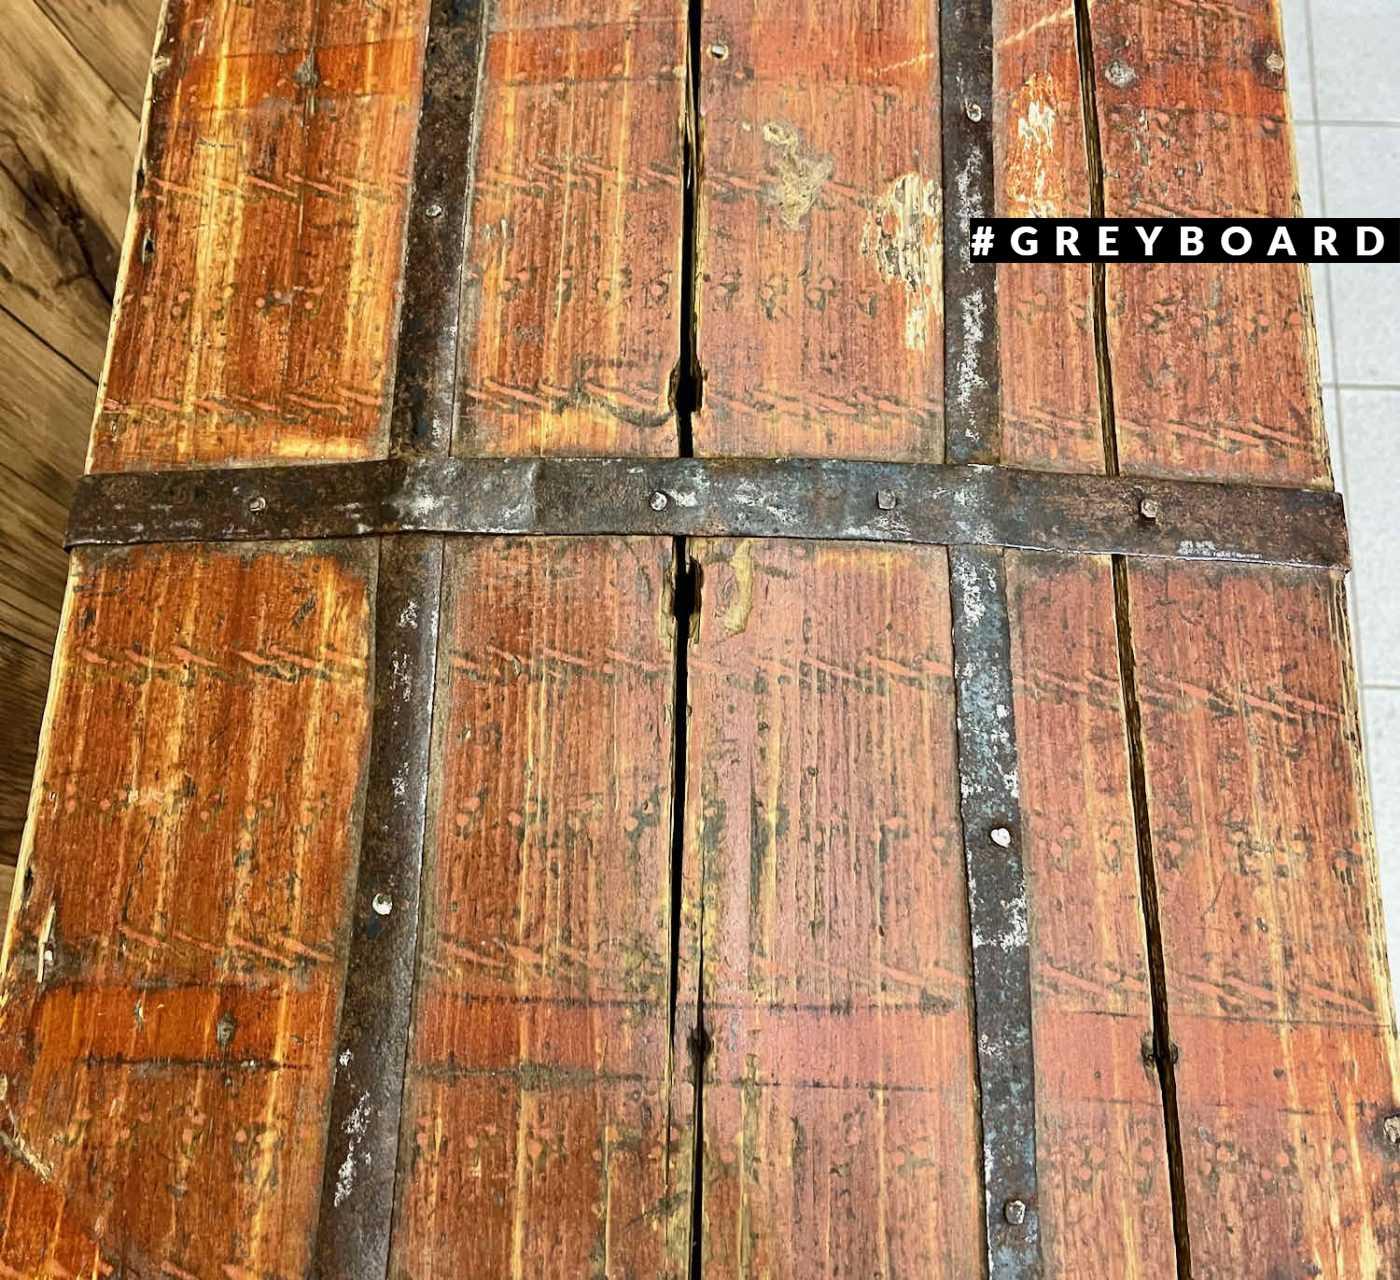 Деревянный сундук с металлическими пластинами